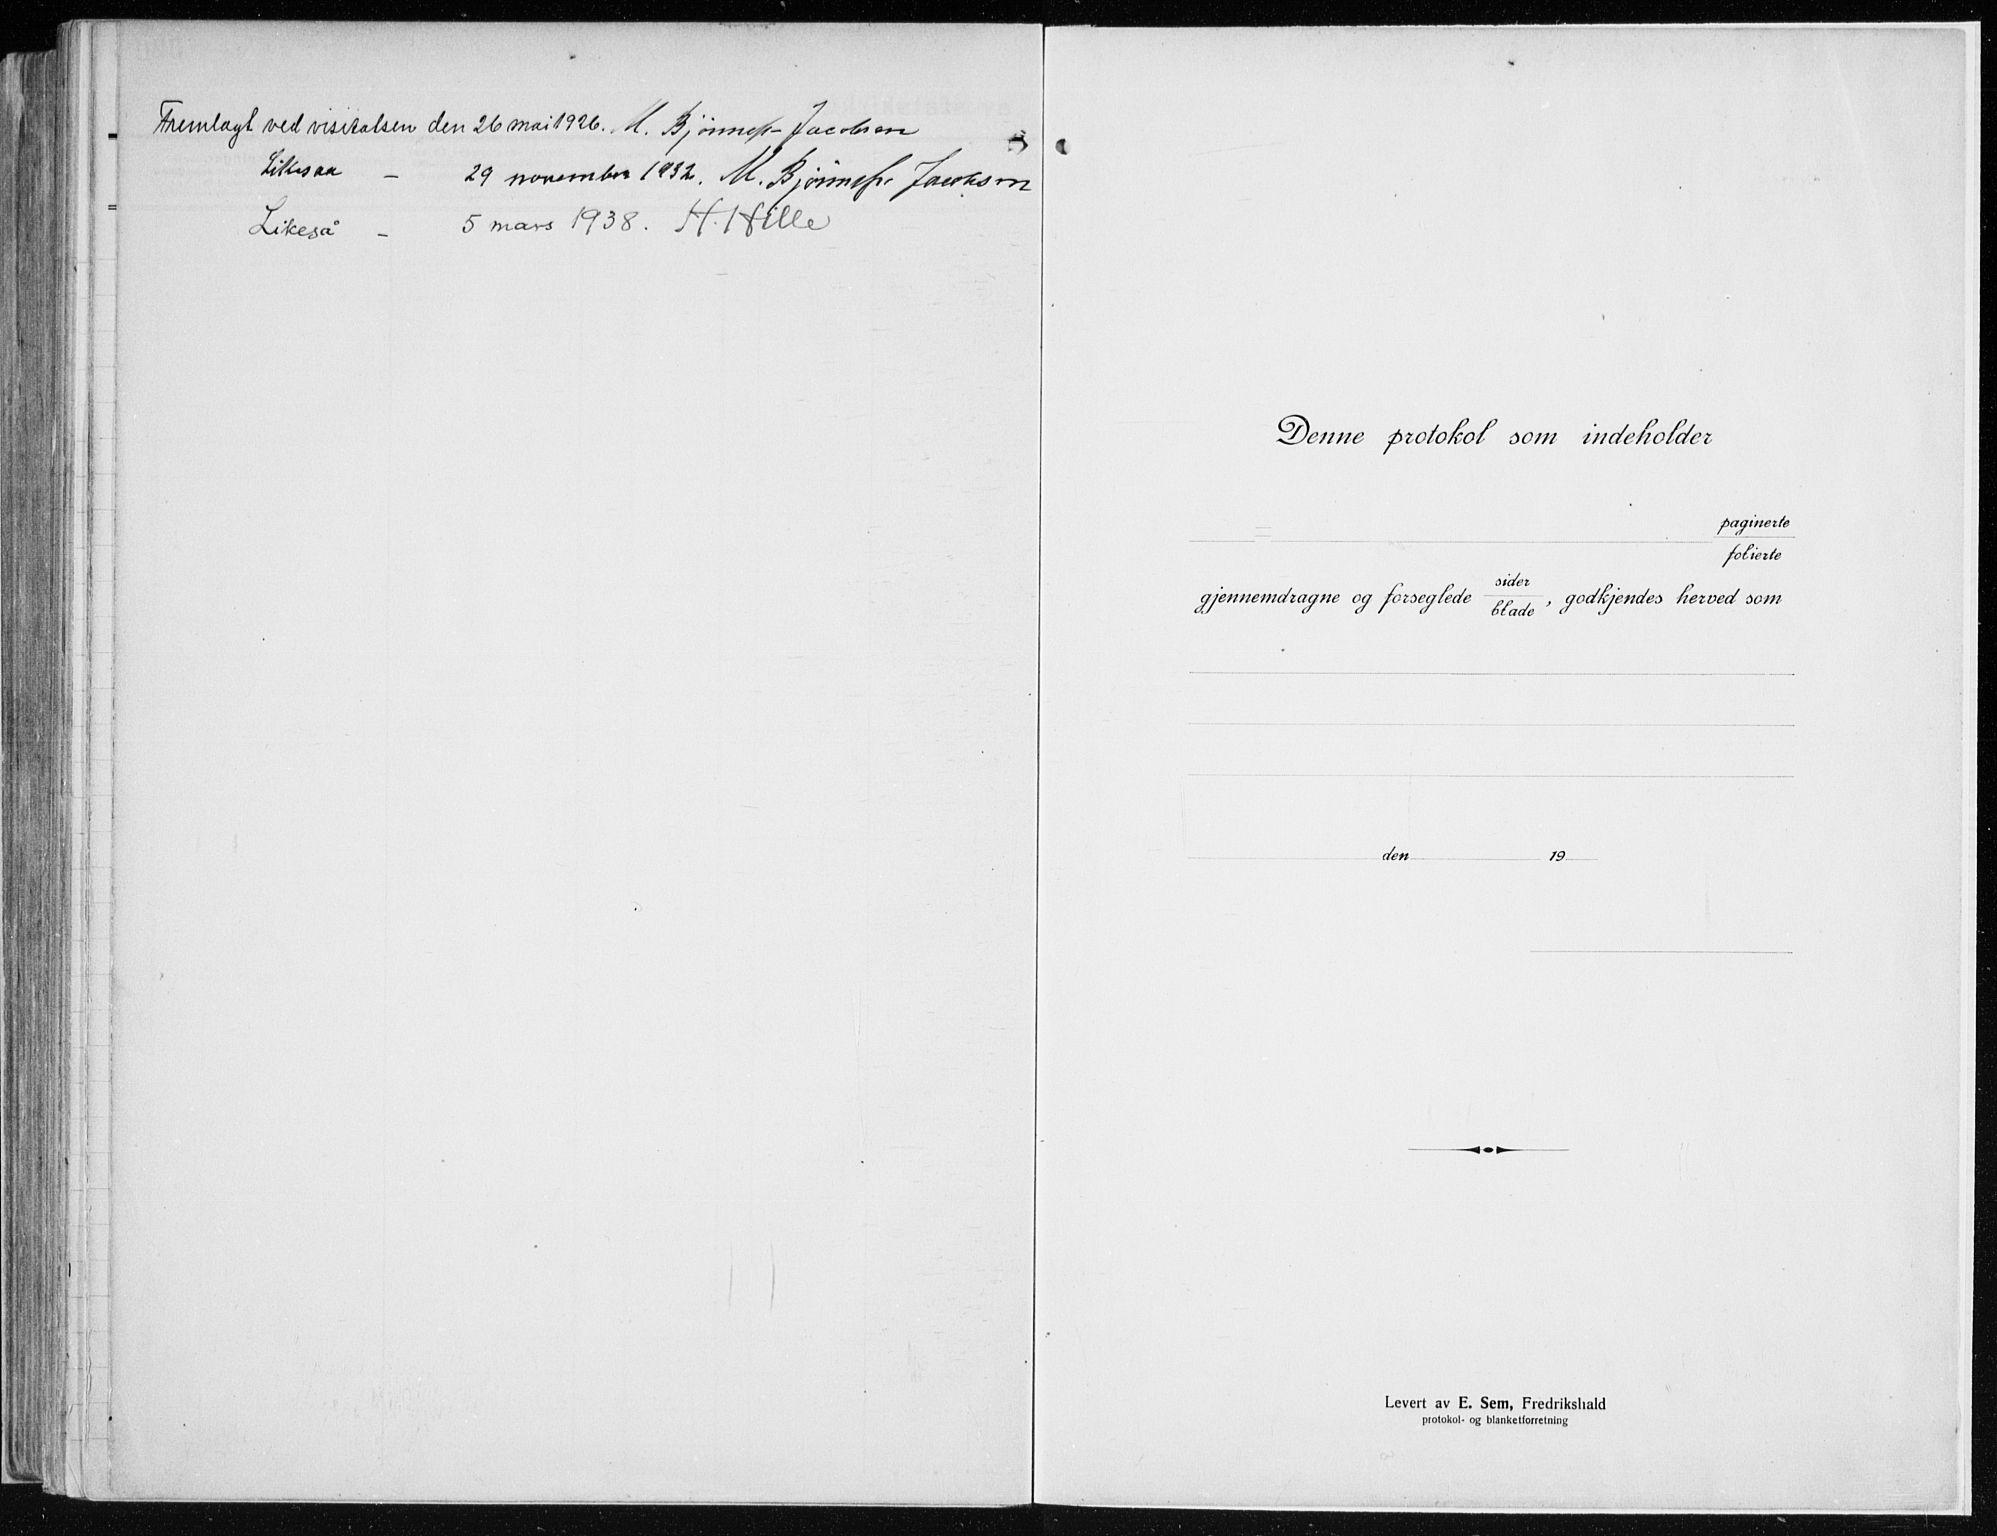 SAH, Vardal prestekontor, H/Ha/Haa/L0015: Ministerialbok nr. 15, 1923-1937